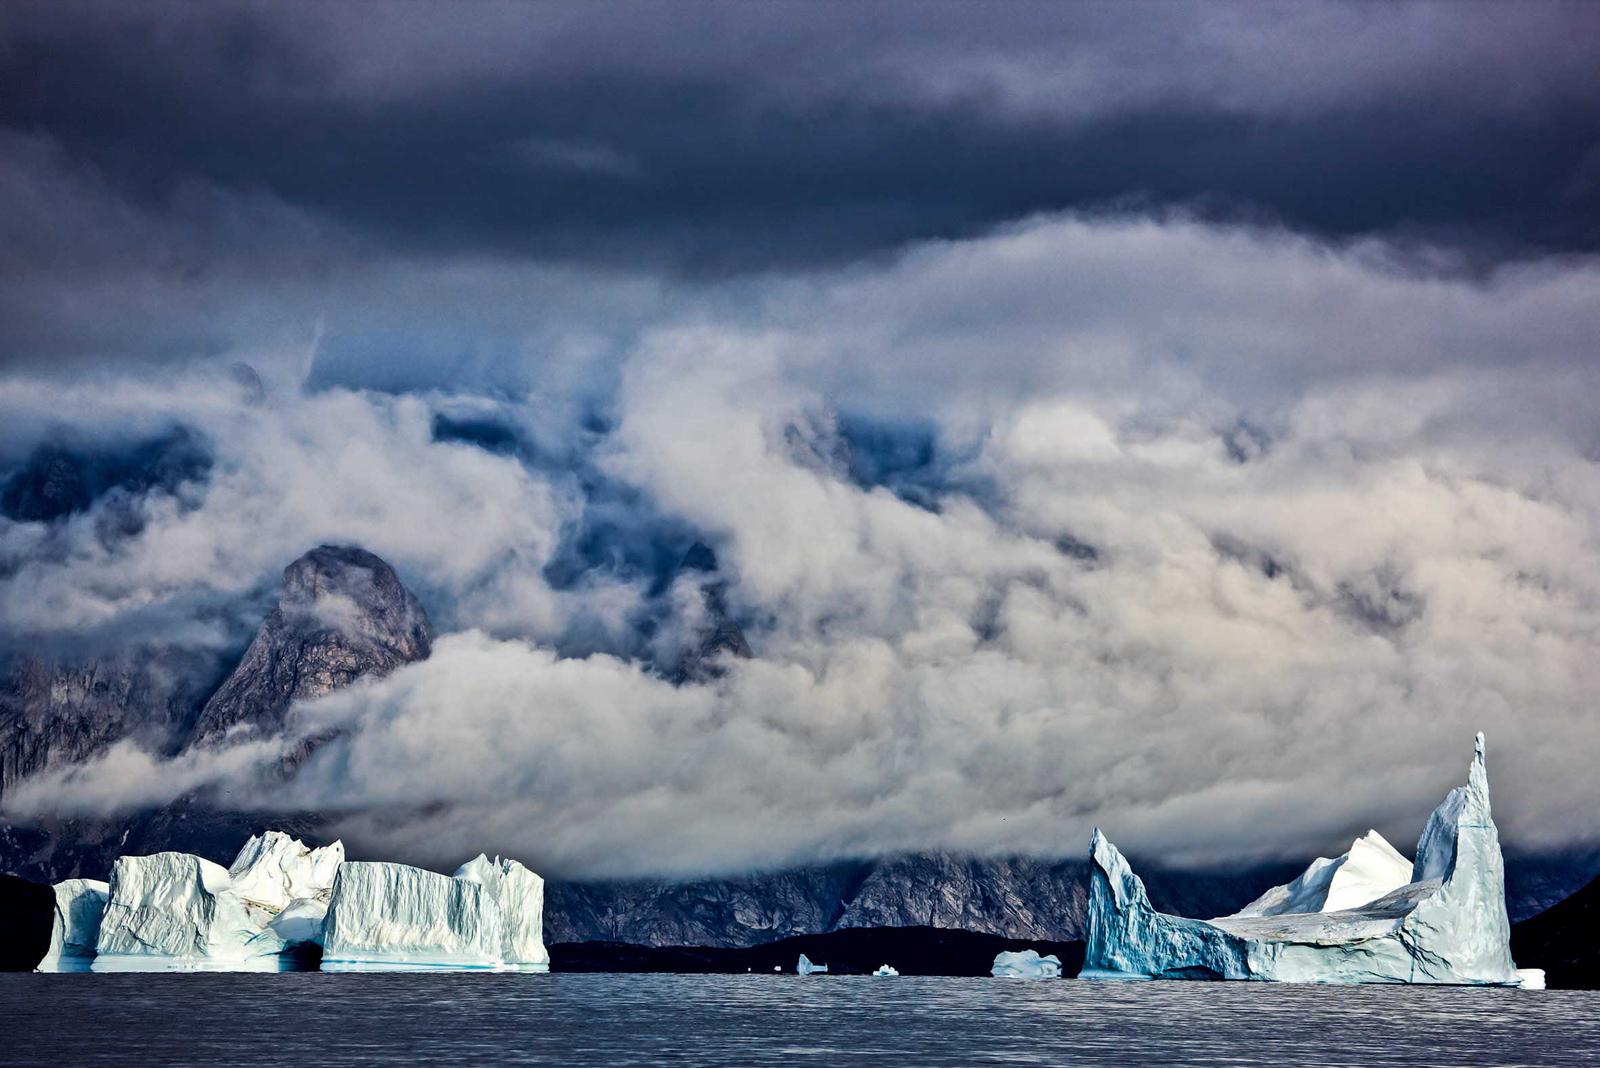 Grönland - Unterwegs im Scoresbysund, dem längsten Fjordsystem der Welt. © Bernd Römmelt/ Knesebeck Verlag